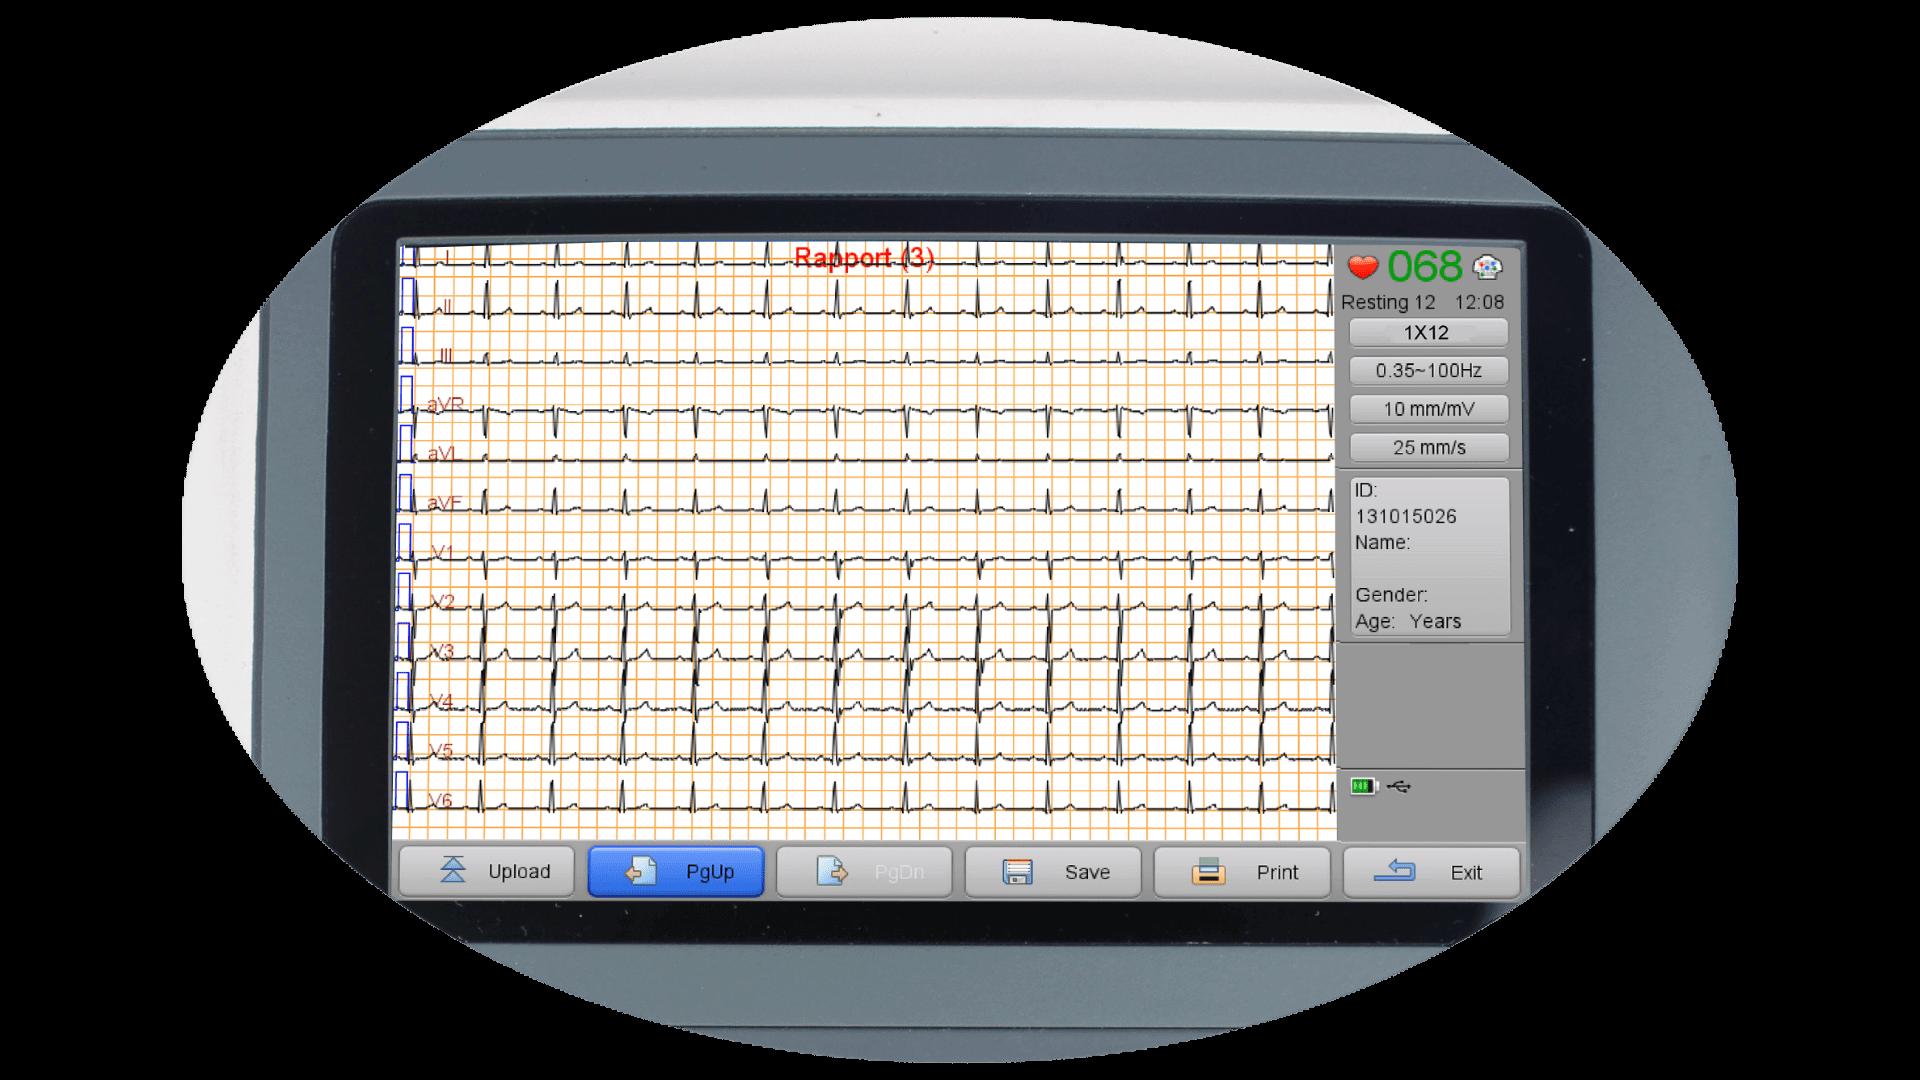 12-lead waveforms screen view of iE 300 ECG machine.